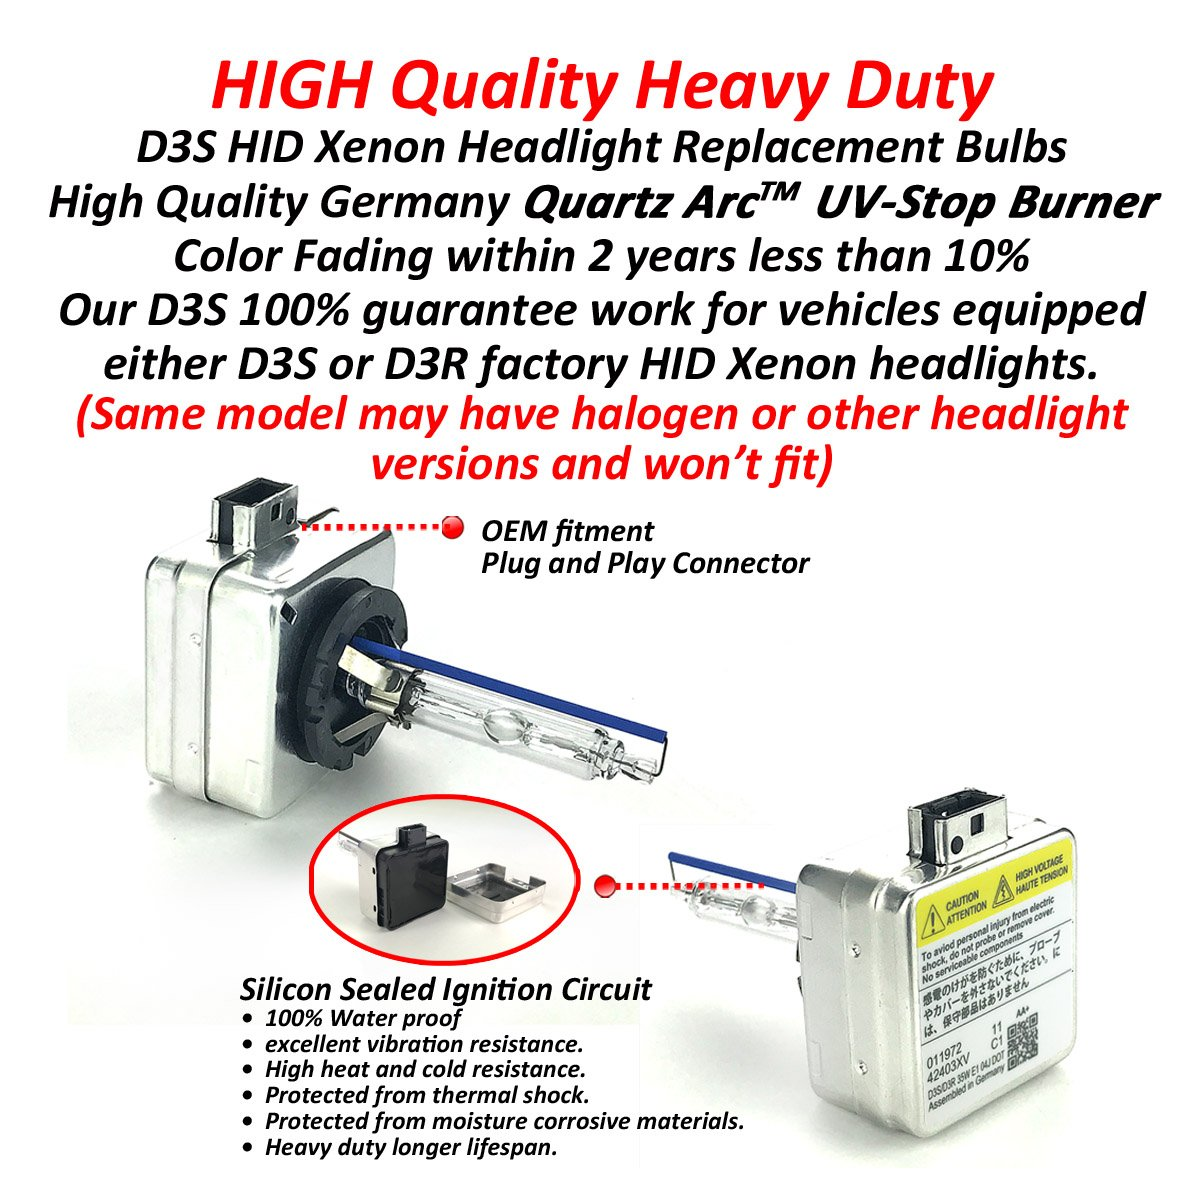 8000K Iceberg Heavy Duty D3S HID Xenon Headlight Replacement Bulbs 35W Non-Mercury High Low Beam Pack of 2